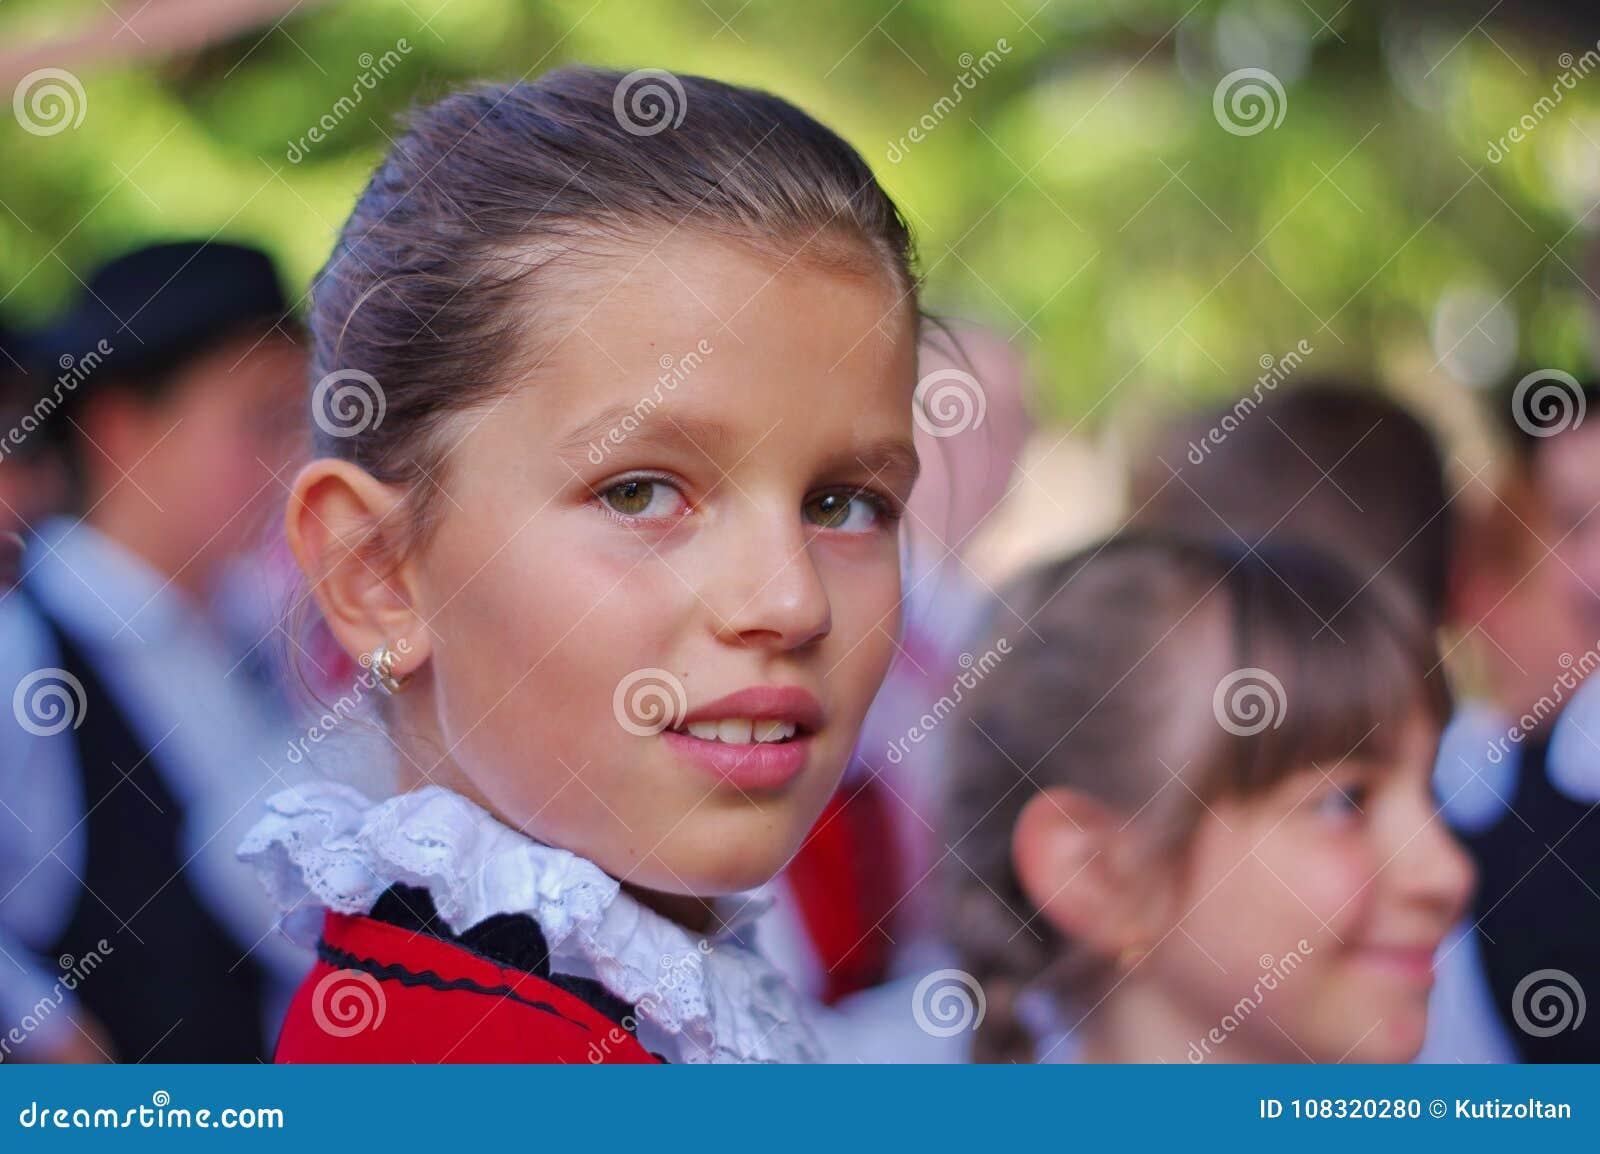 Pure beauty. Portrait of a young szekler girl